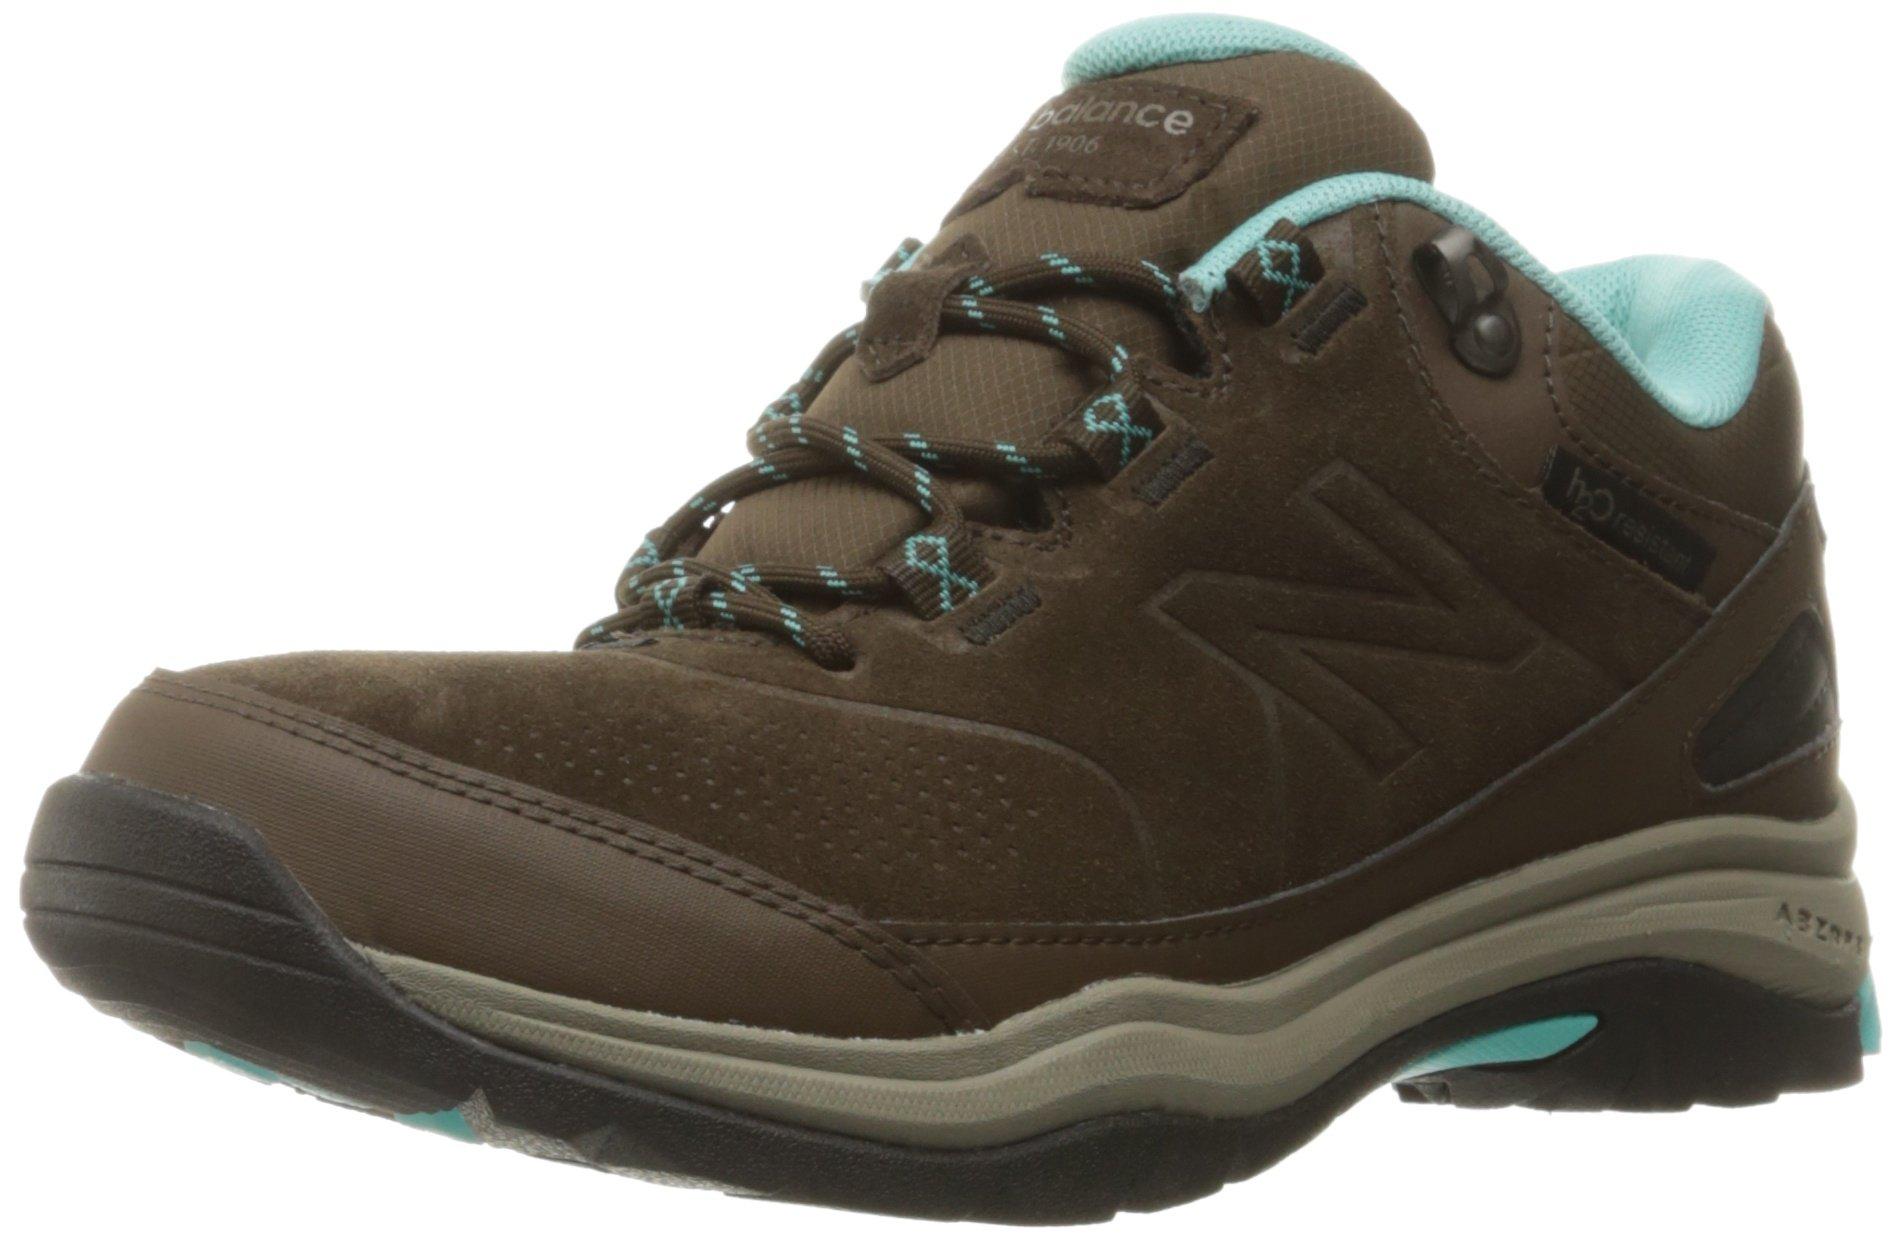 New Balance Women's 779v1 Trail Walking Shoe, Brown, 6.5 D US